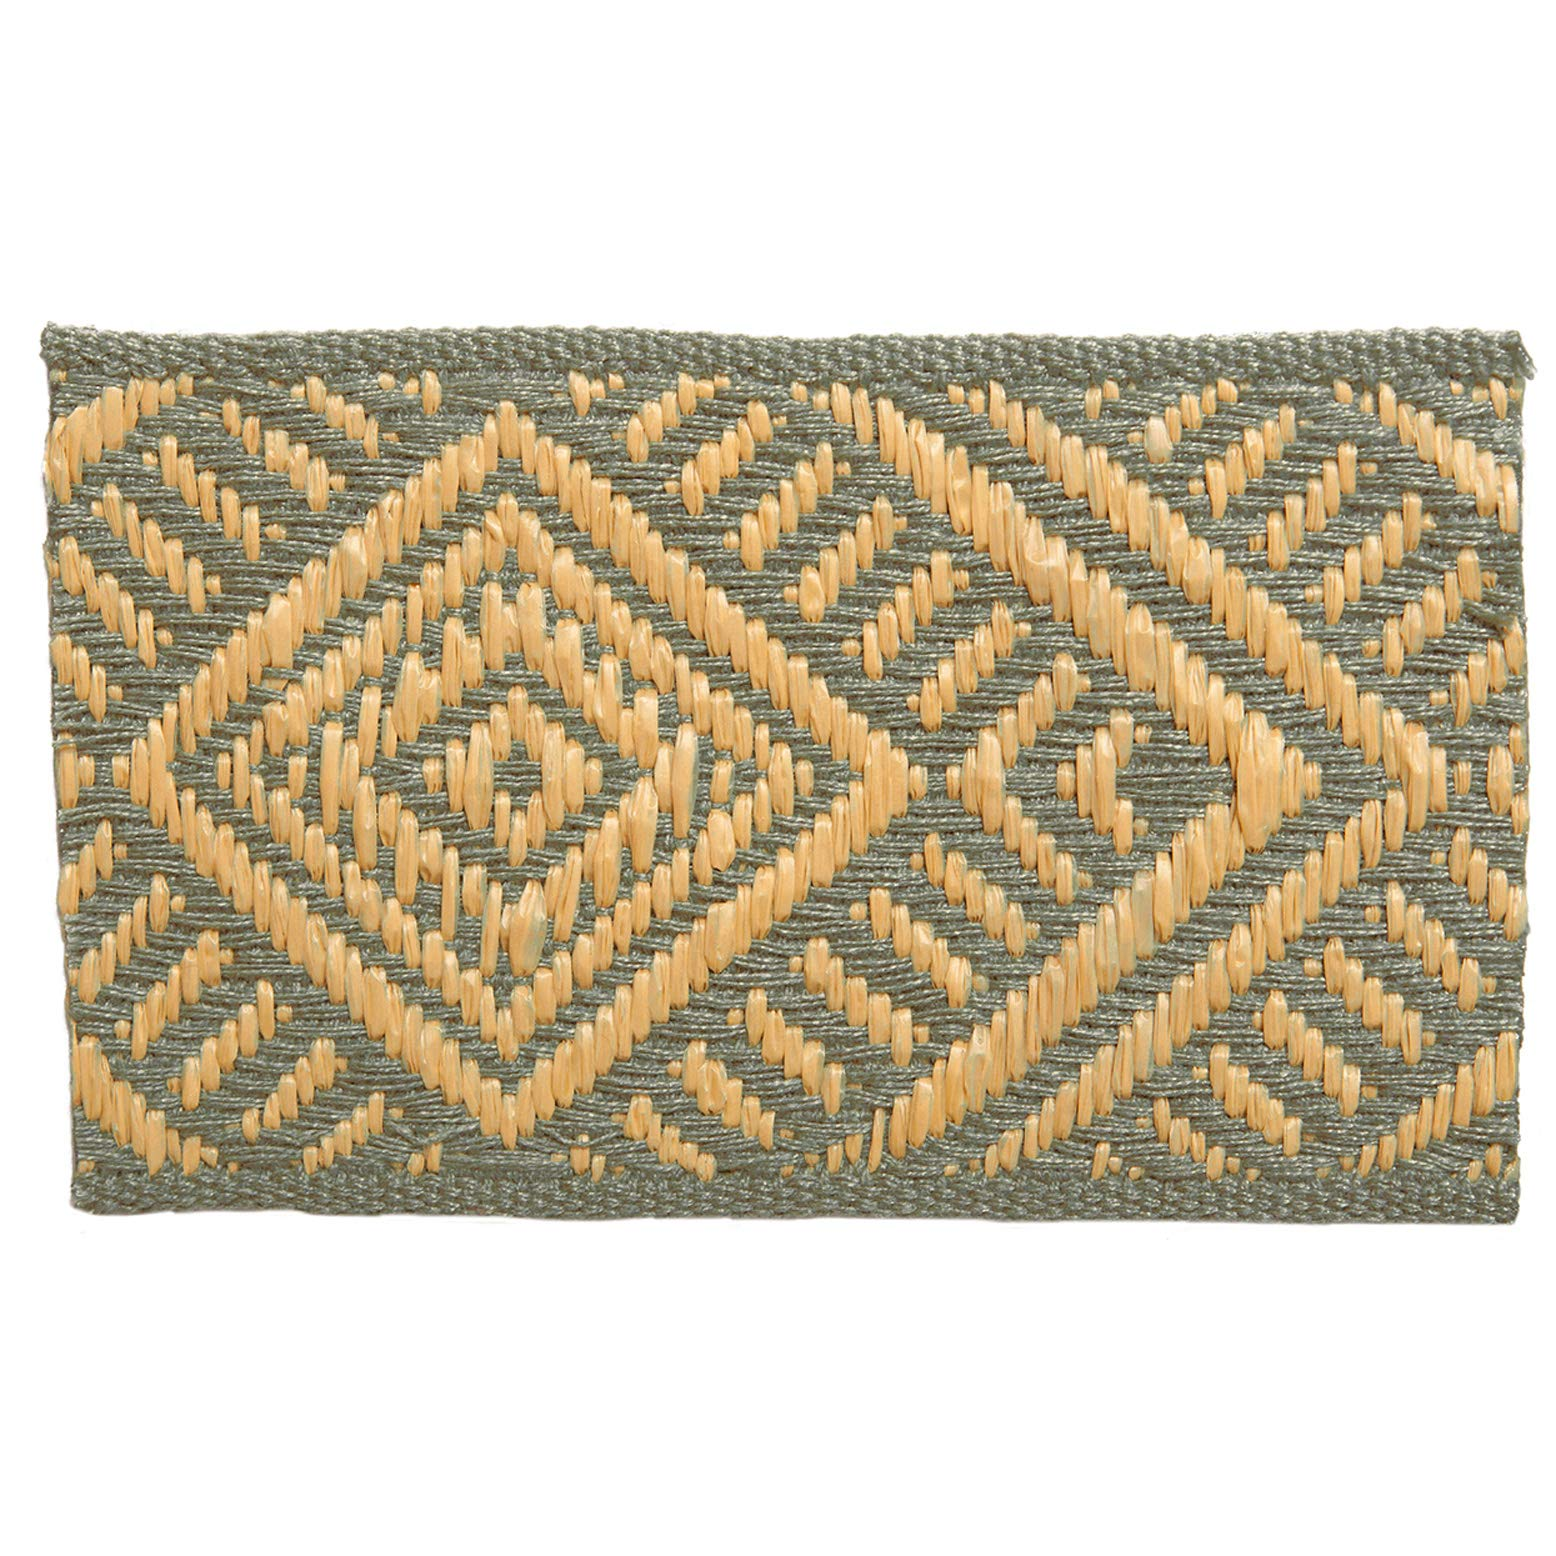 Kravet Design Bistro Braid Driftwood T30609 1106 by Fabric & Fabric